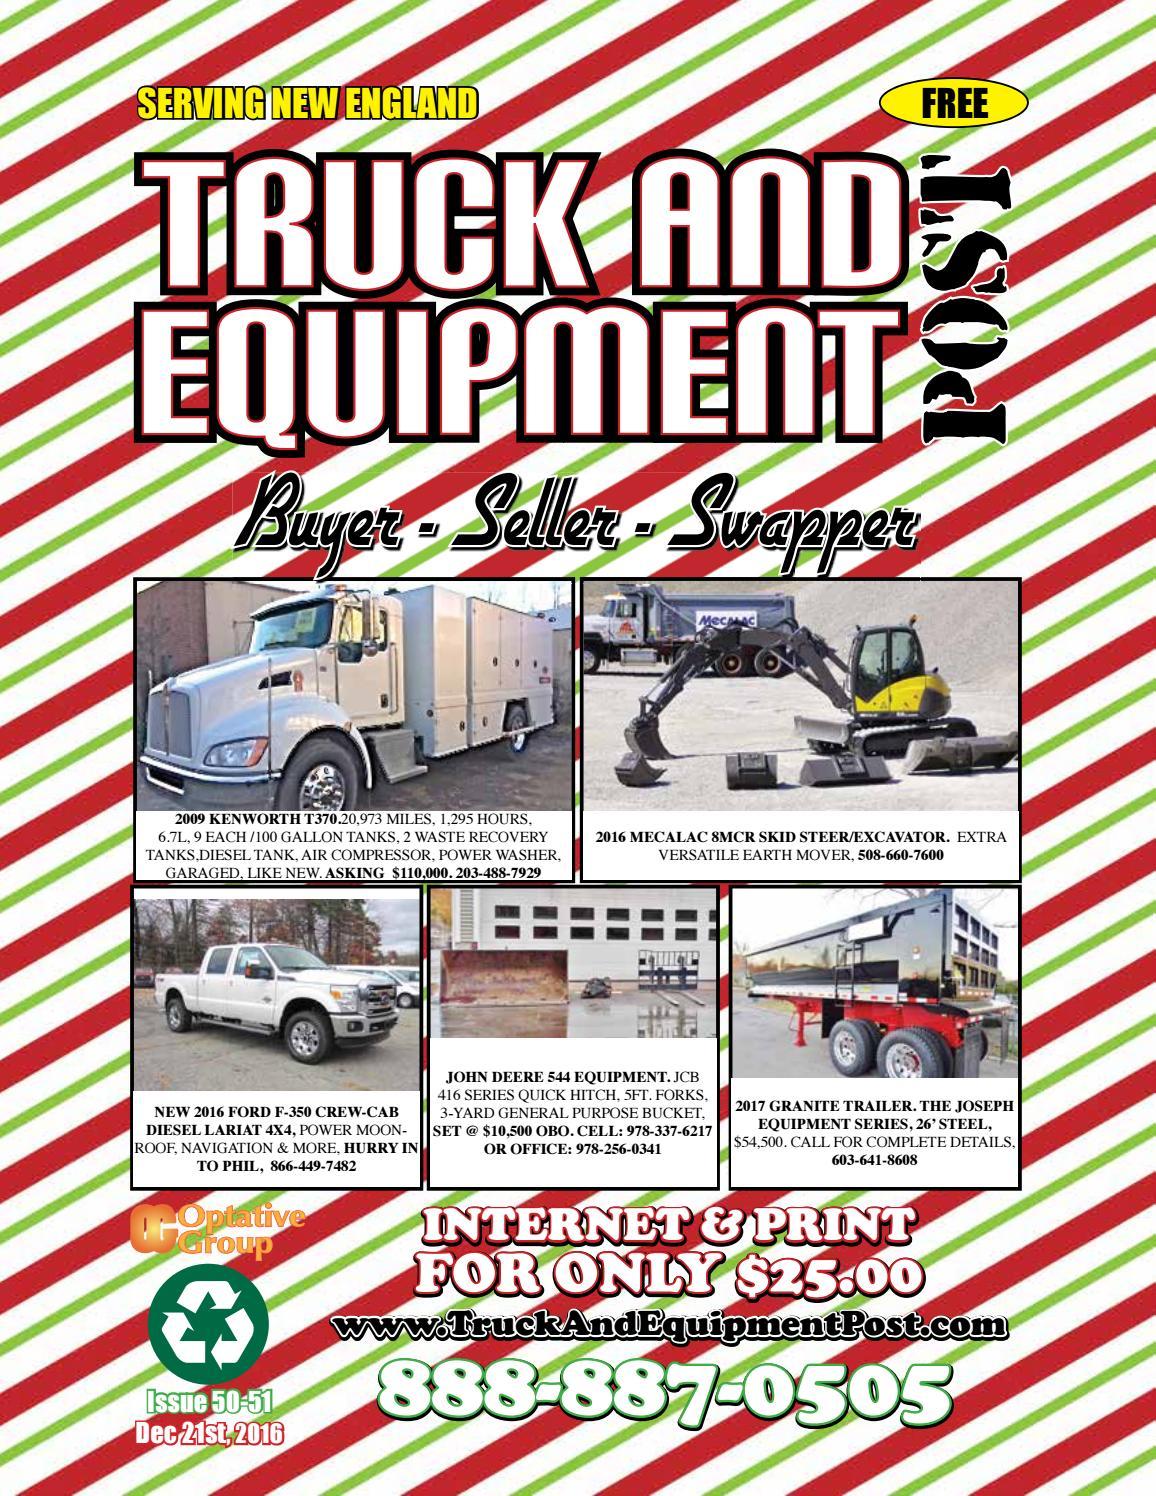 Truck equipment post 50 51 2016 by 1ClickAway - issuu